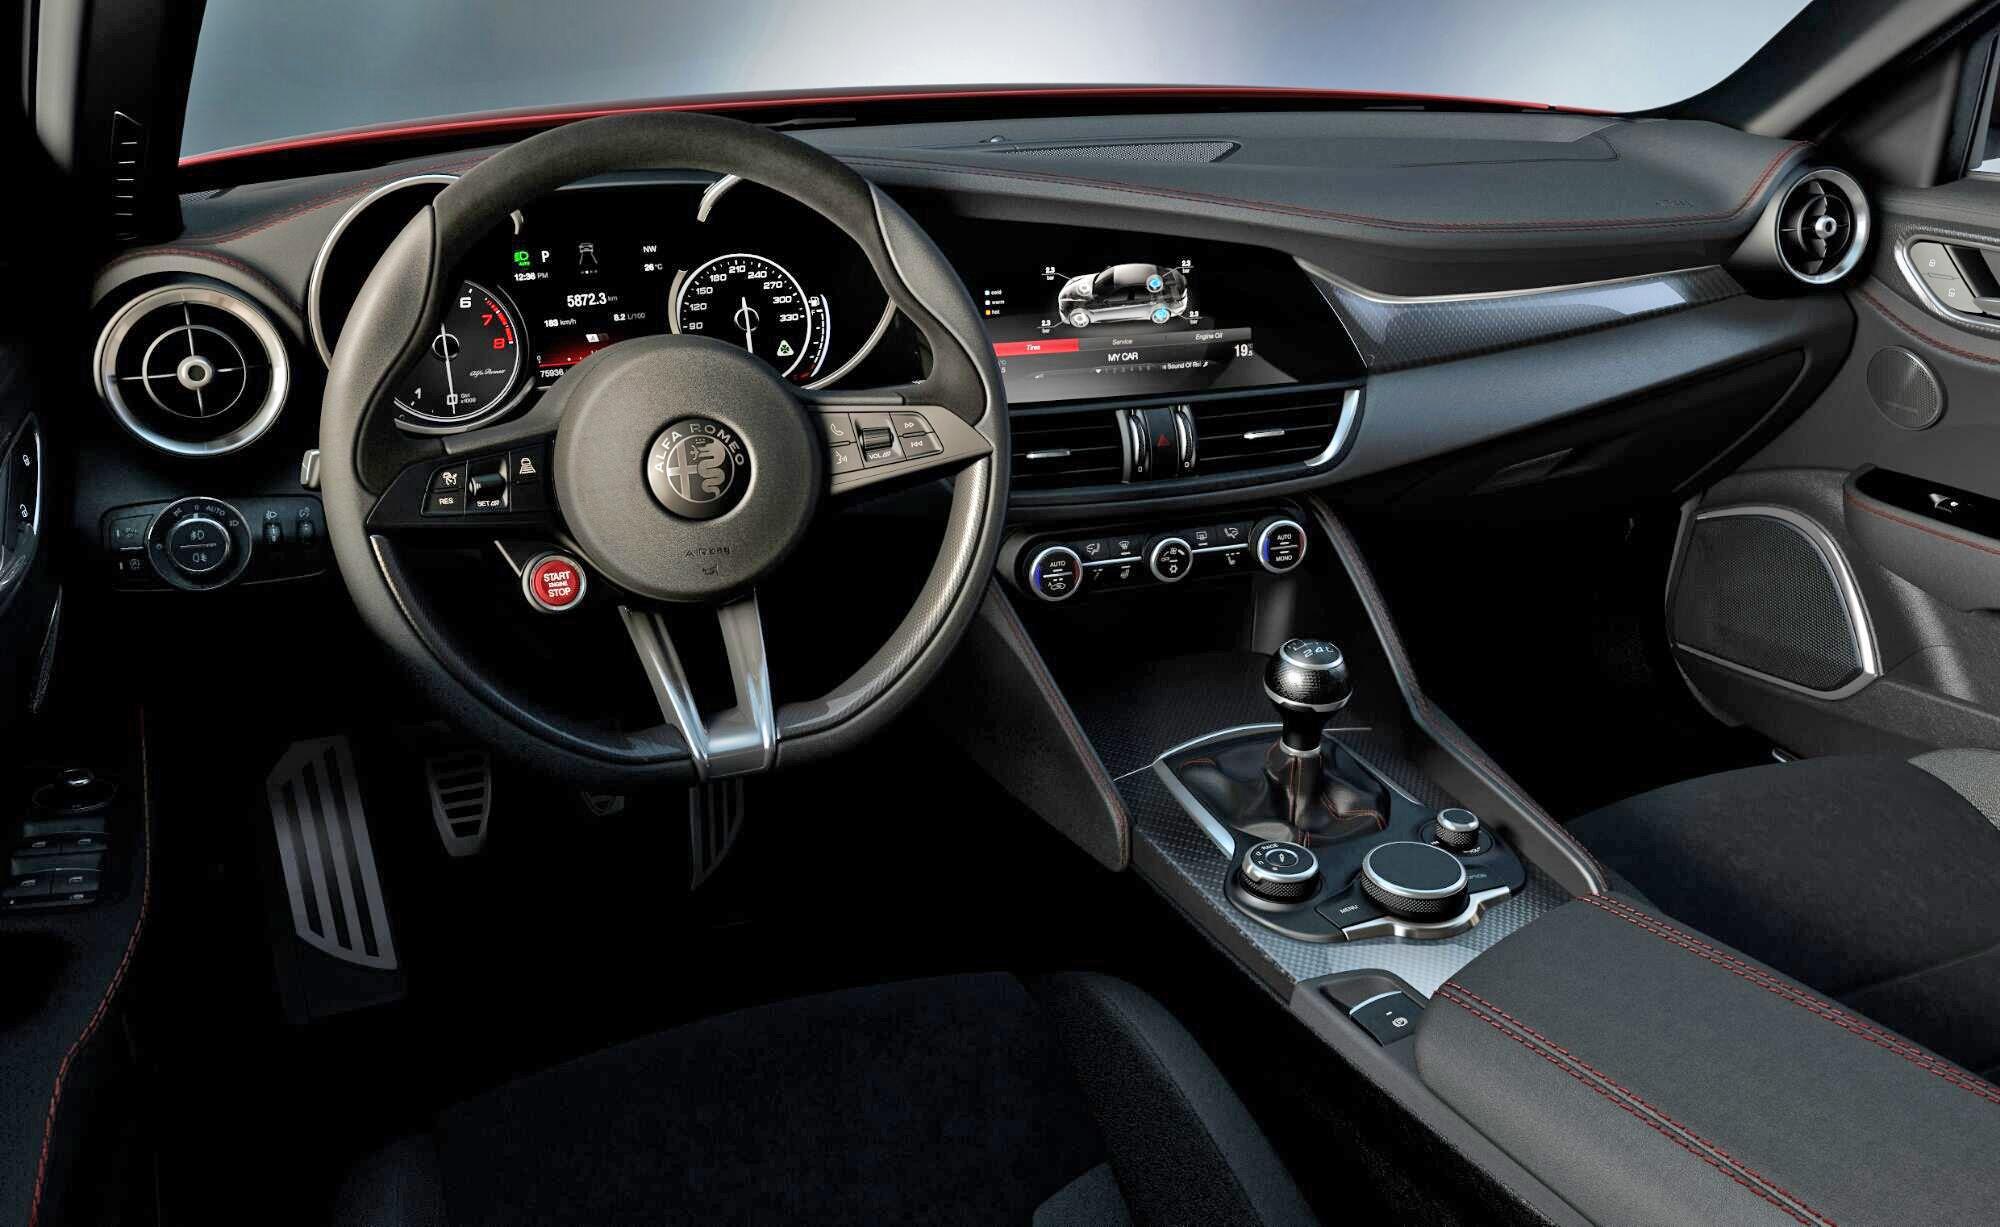 2018 Alfa Romeo Giulia Review 2018 Cars Release 2019 Alfa Romeo